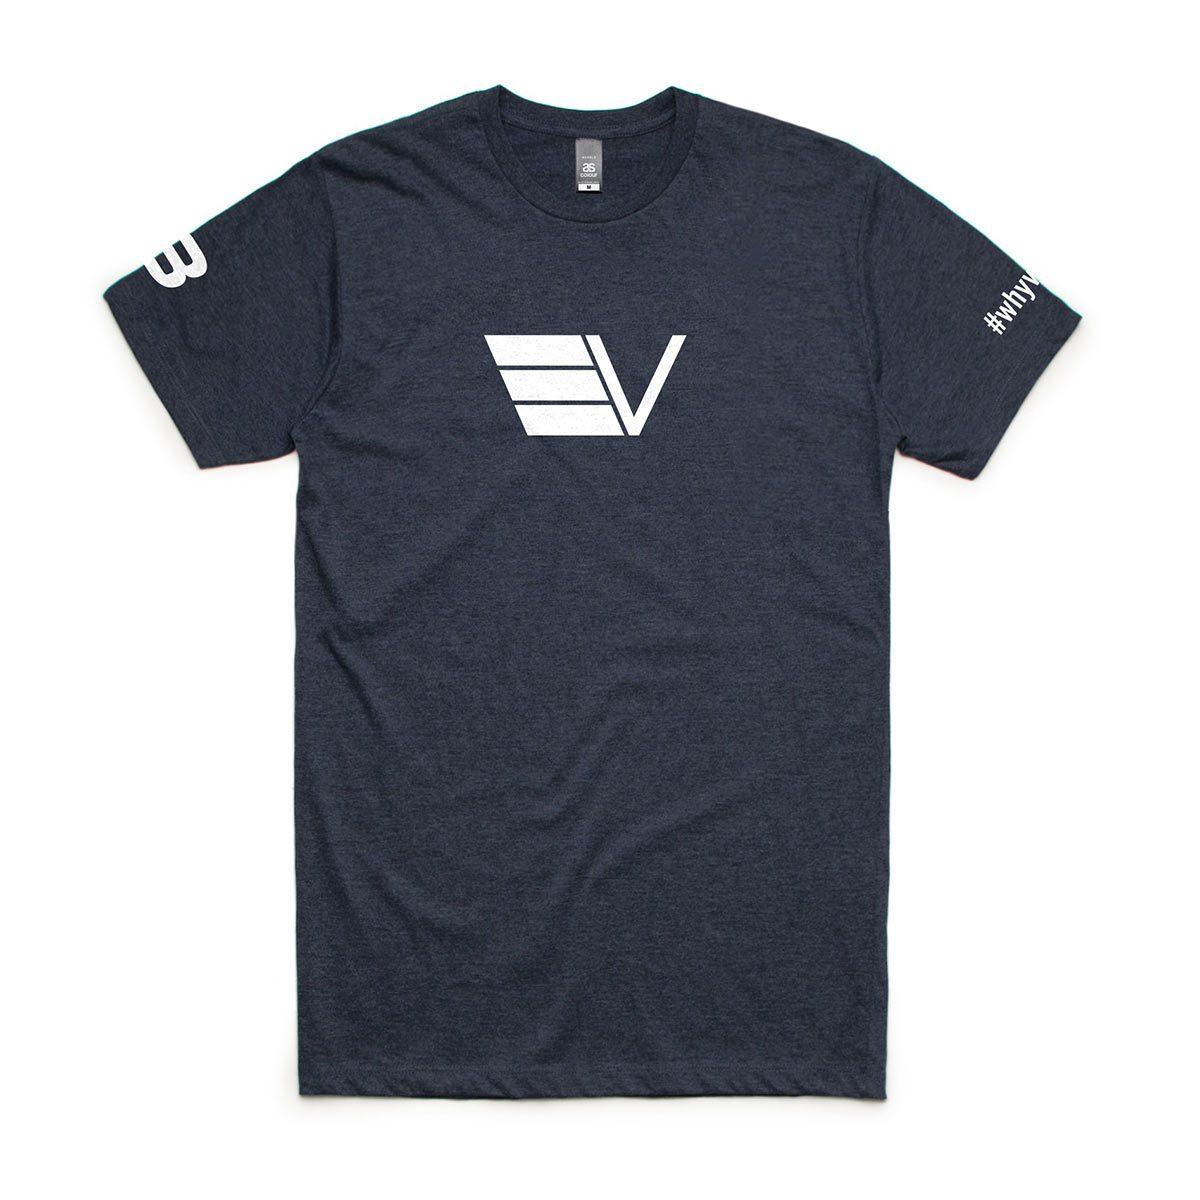 Velothon - OTS - 5006 Mens T-Shirt - AS Colour - Flat Lay